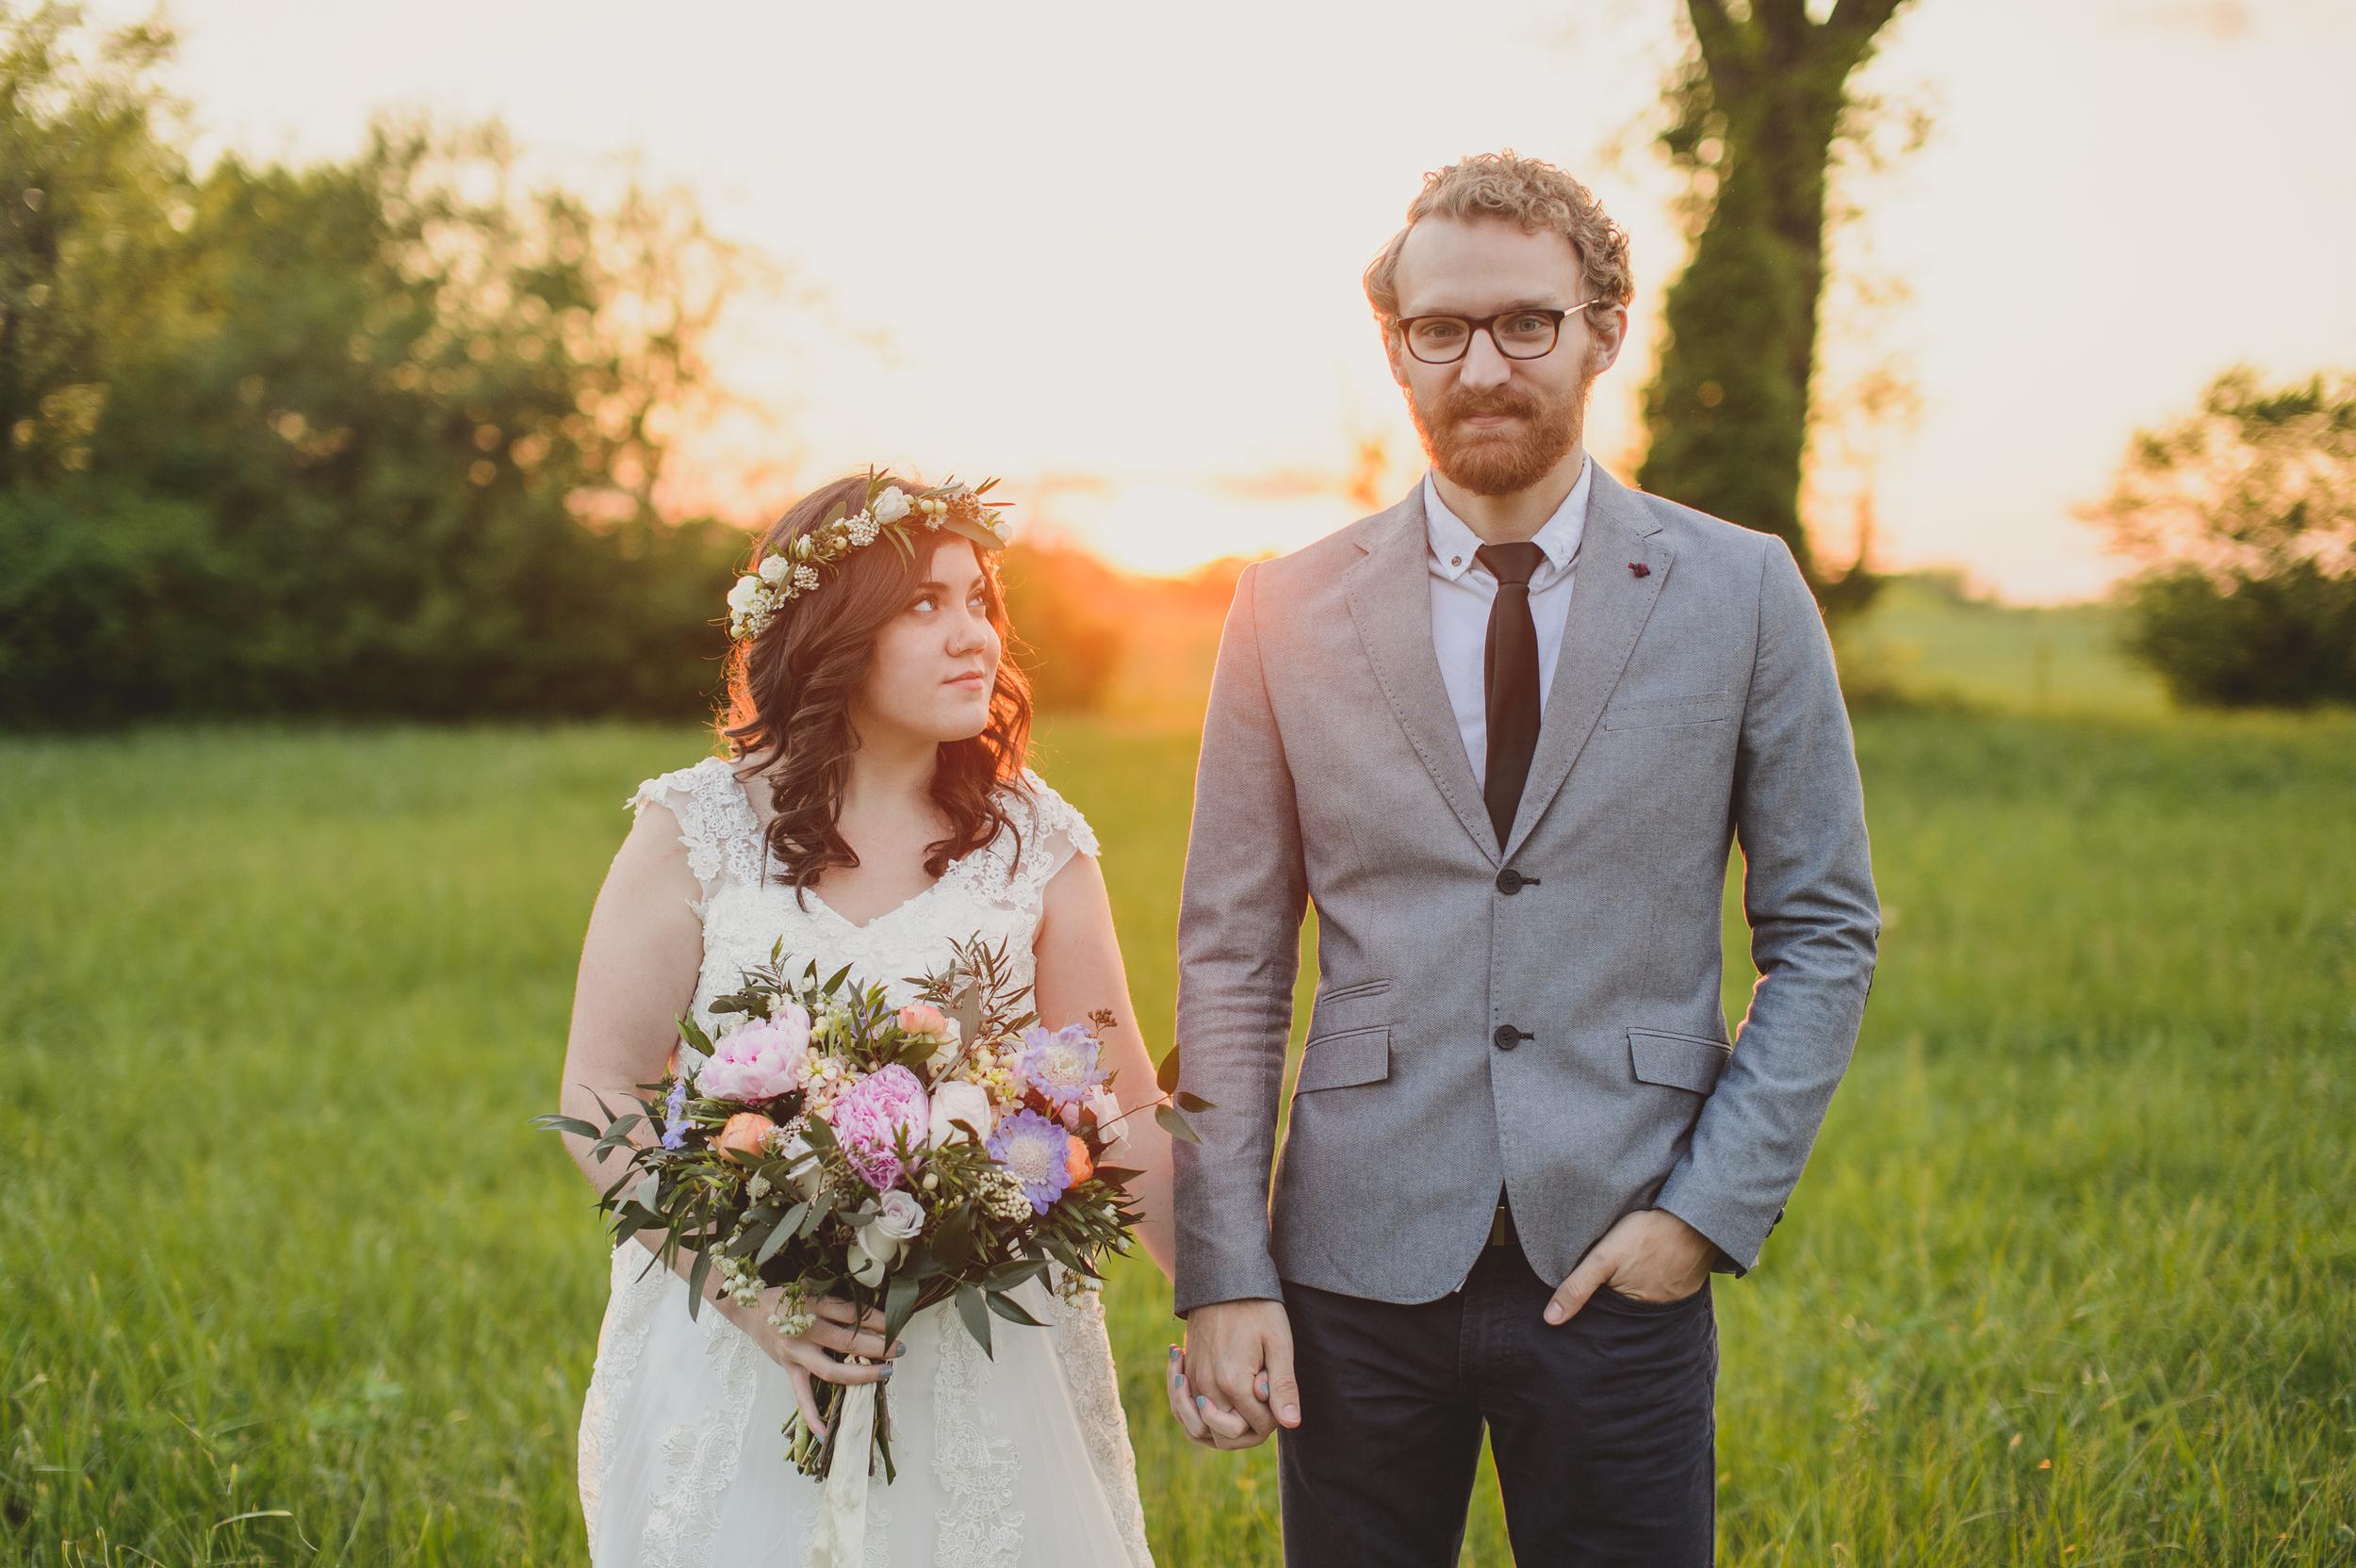 Newlywed Portrait Session // Nashville Wedding Florist